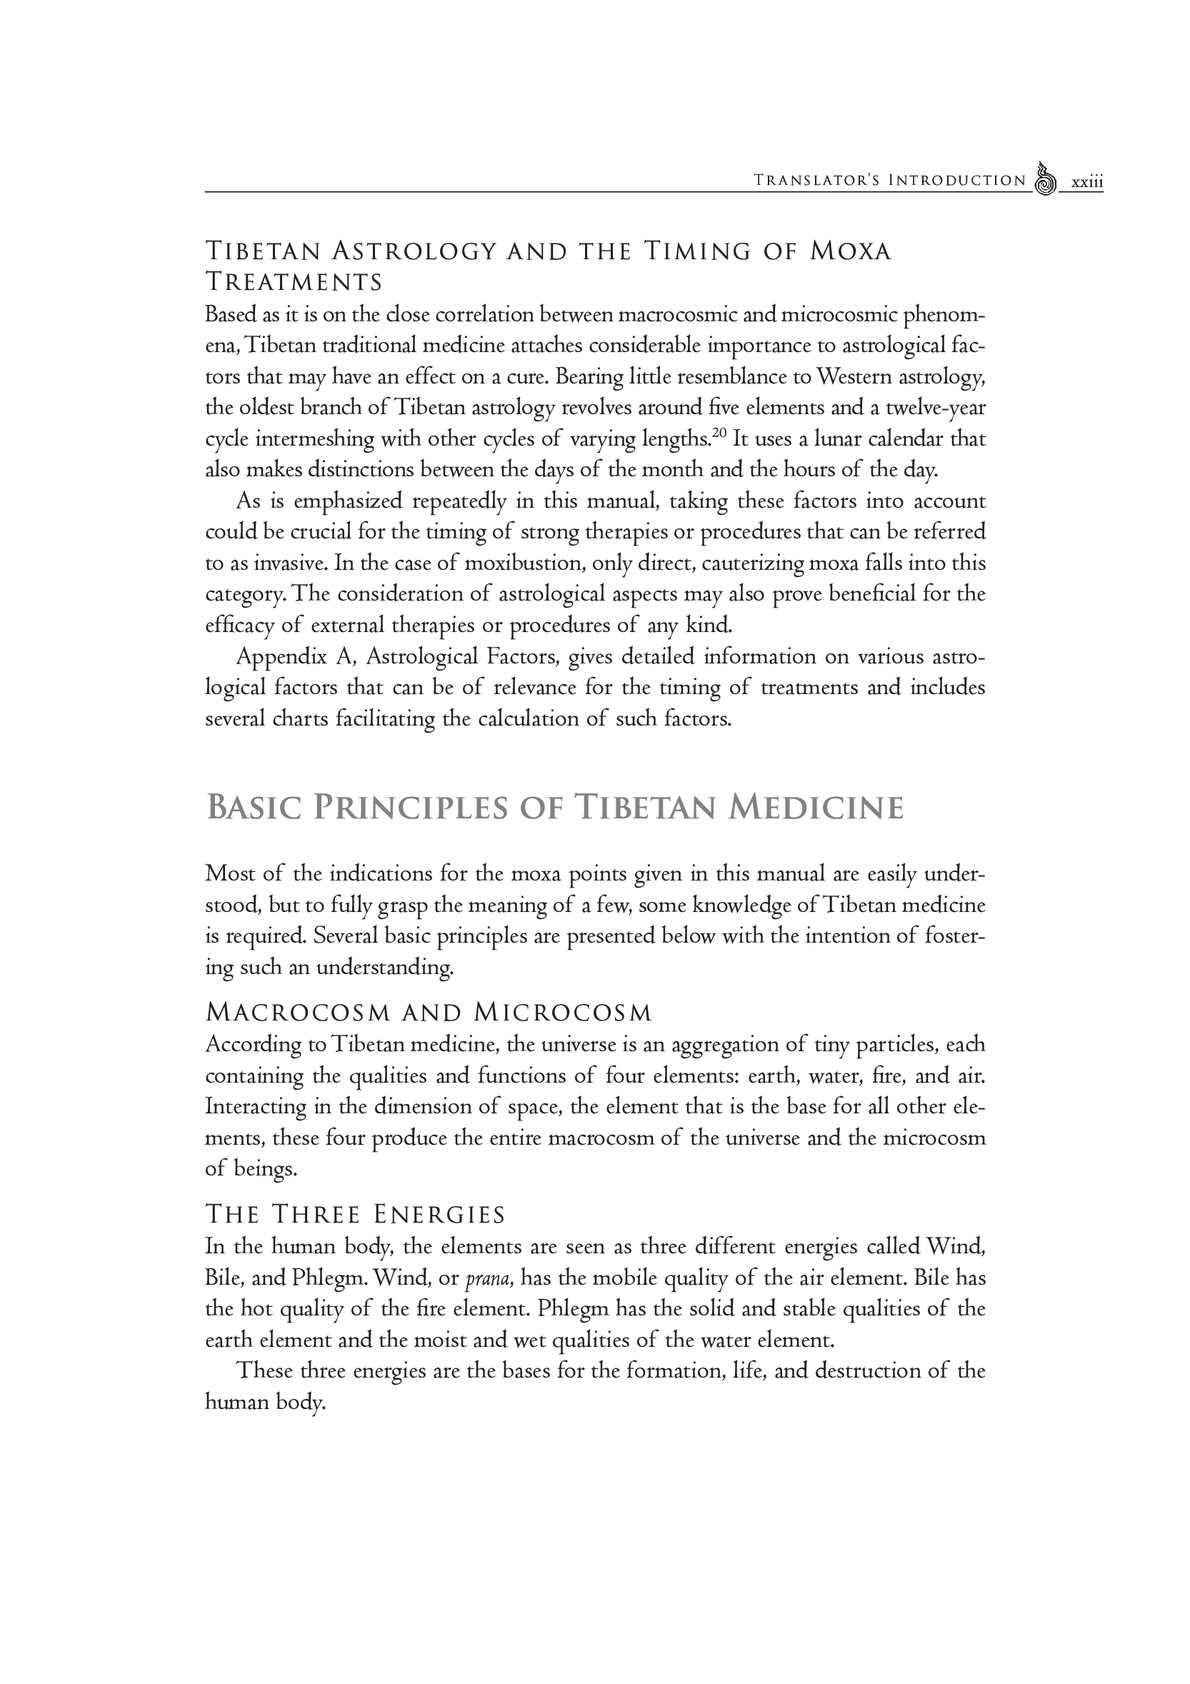 tibetan medicine charts